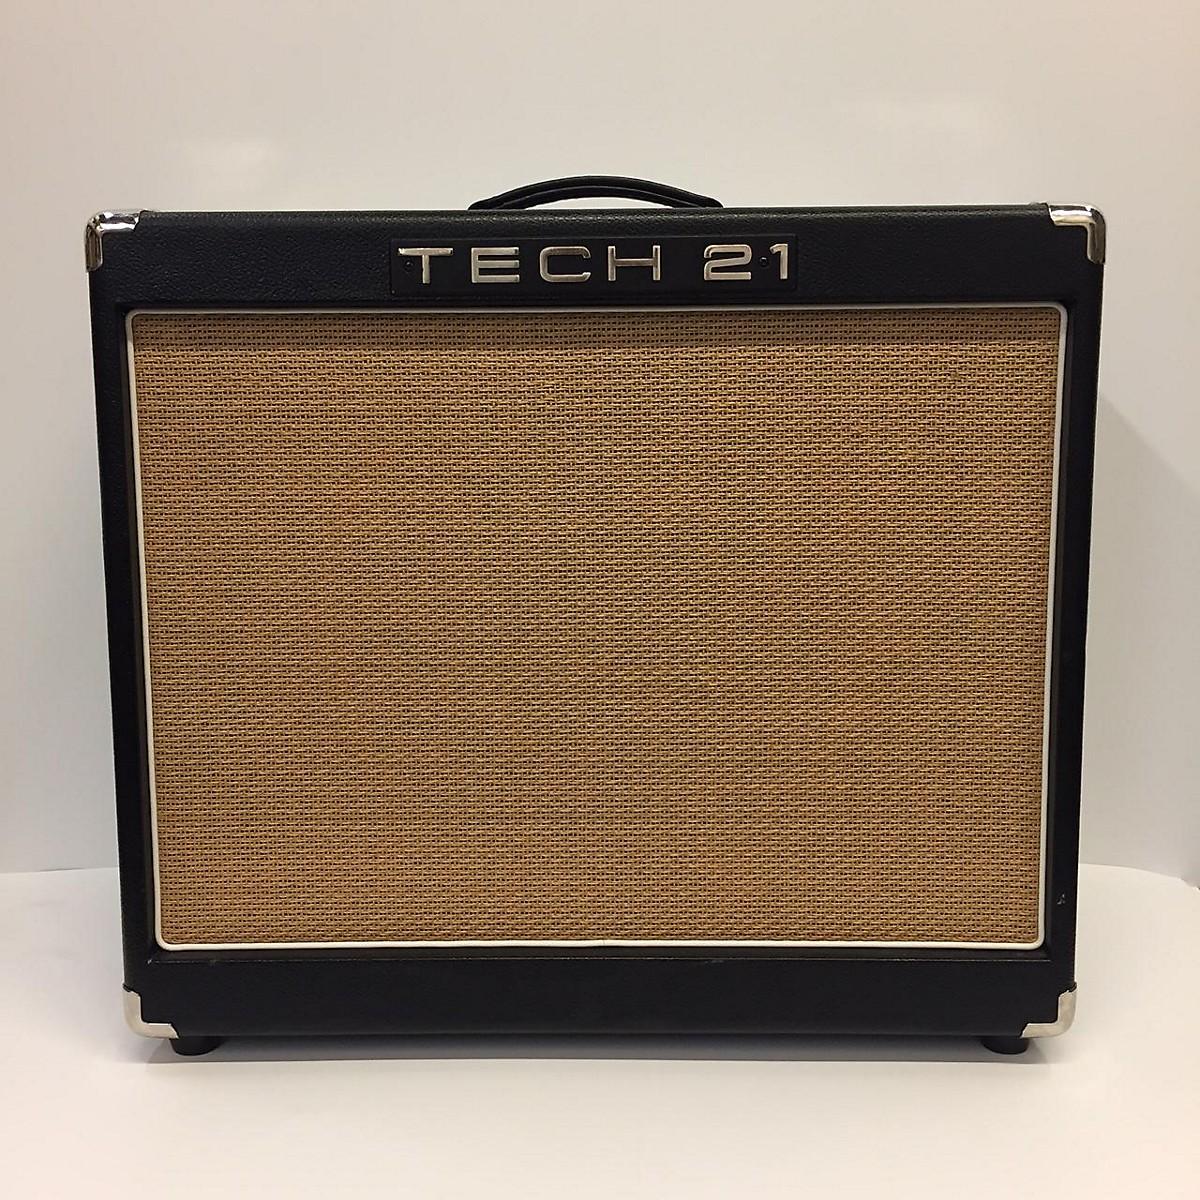 Tech 21 POWER ENGINE 60 Guitar Power Amp